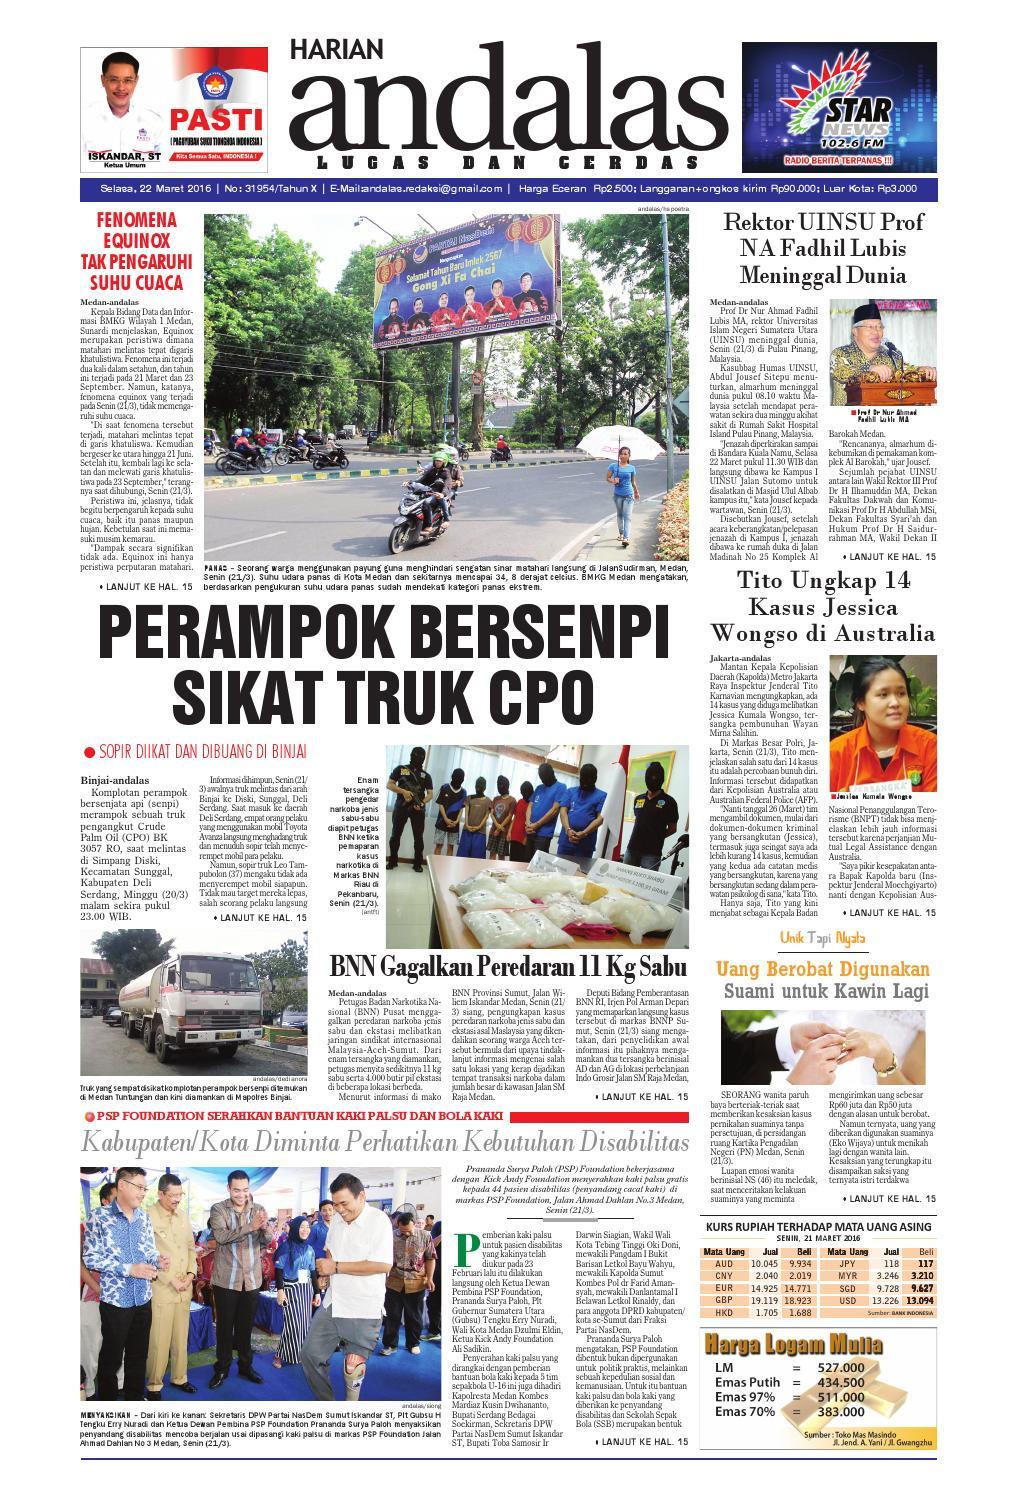 Epaper Andalas Edisi Selasa 22 Maret 2016 By Media Issuu Fcenter Lemari Pakaian Wd Hk 1802 Sh Jawa Tengah